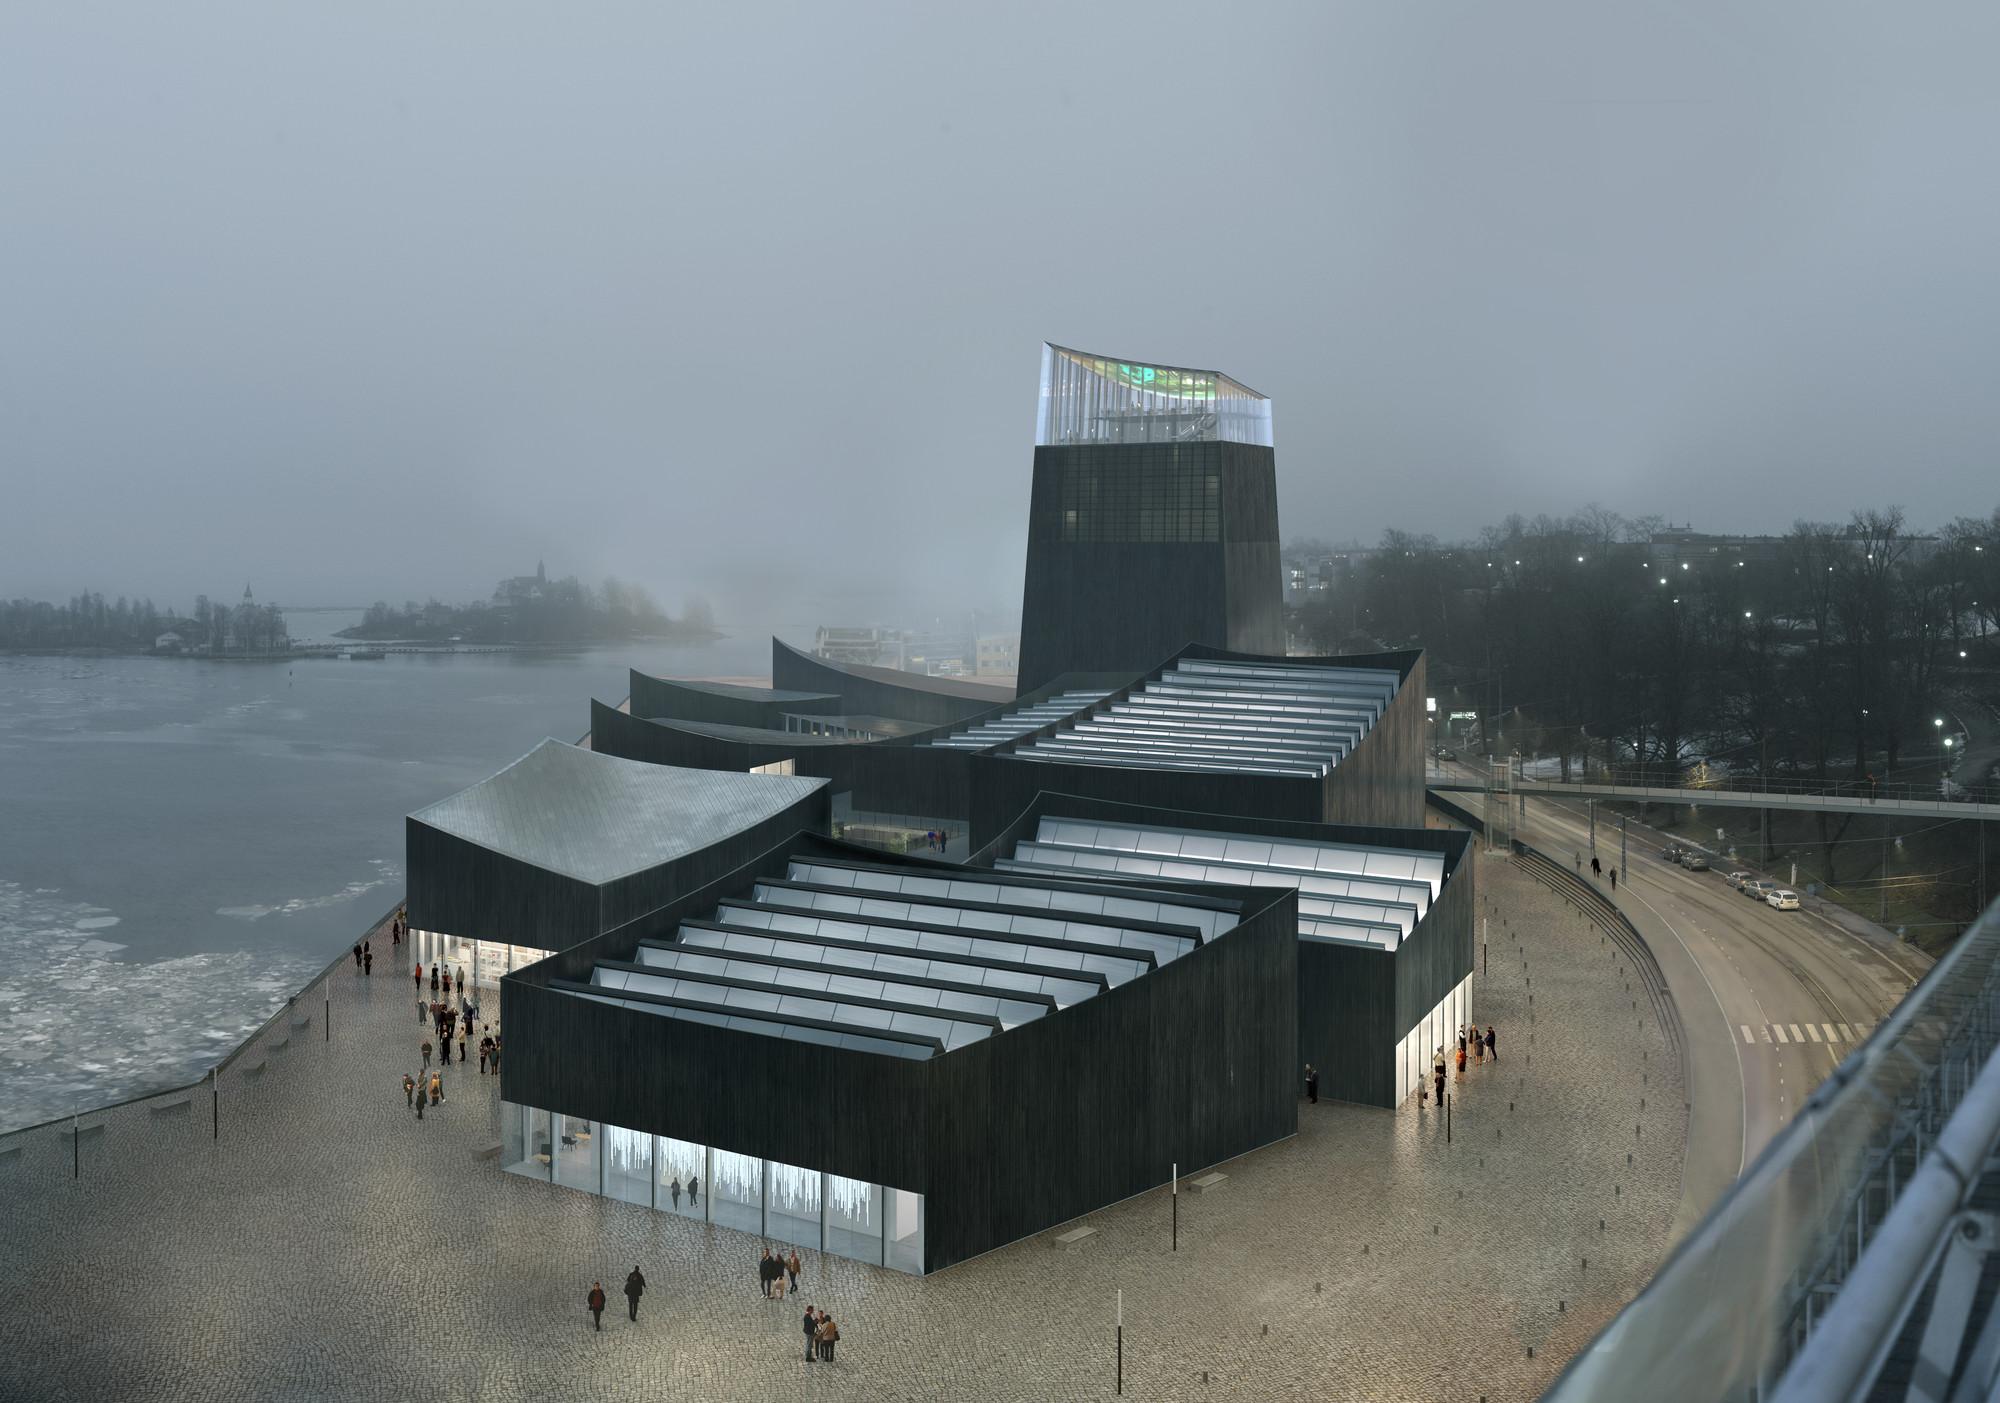 Propuesta 'Art in the City' de Moreau Kusunoki gana concurso Guggenheim Helsinki, Propuesta ganadora. Image © Moreau Kusunoki Architectes / Guggenheim